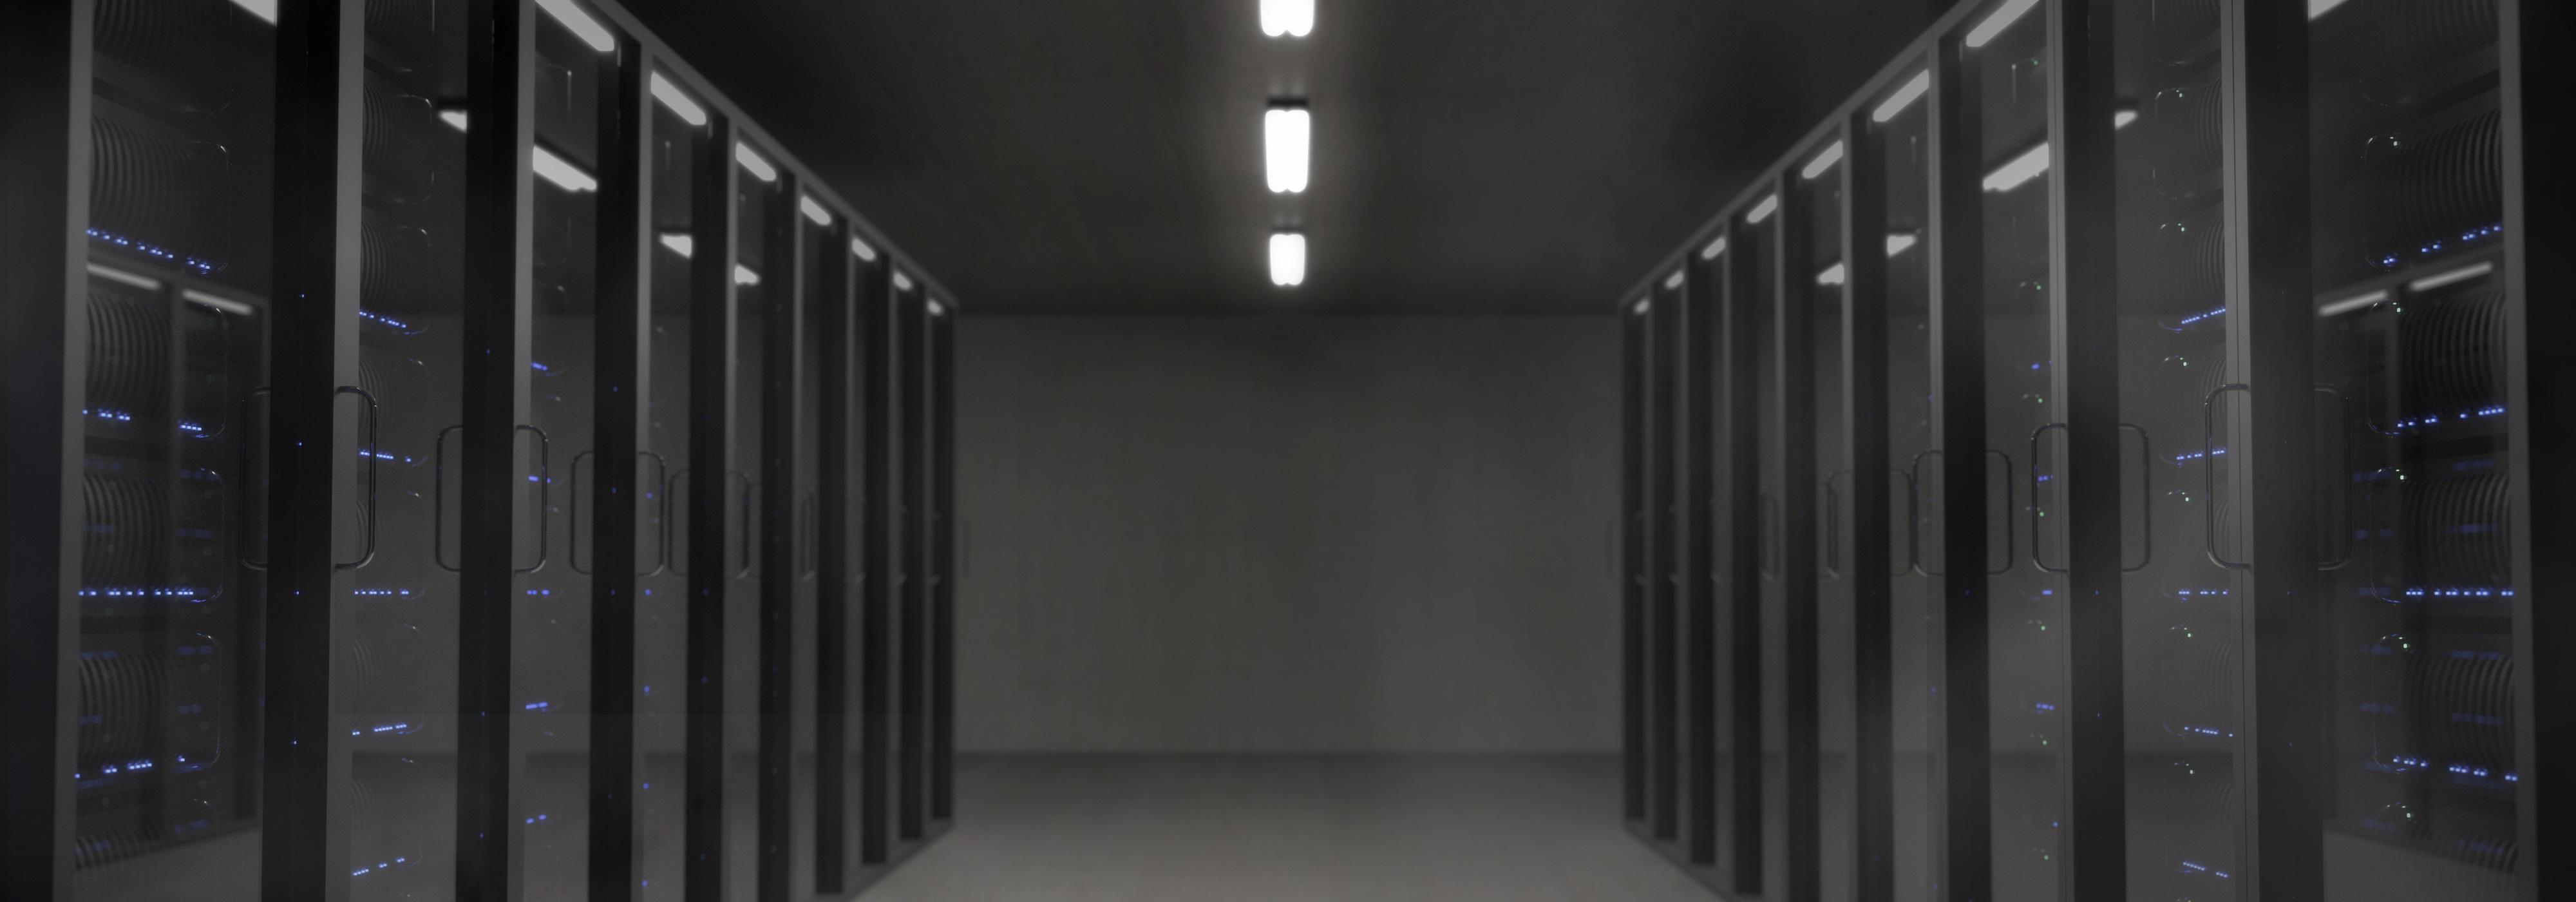 Sever Room